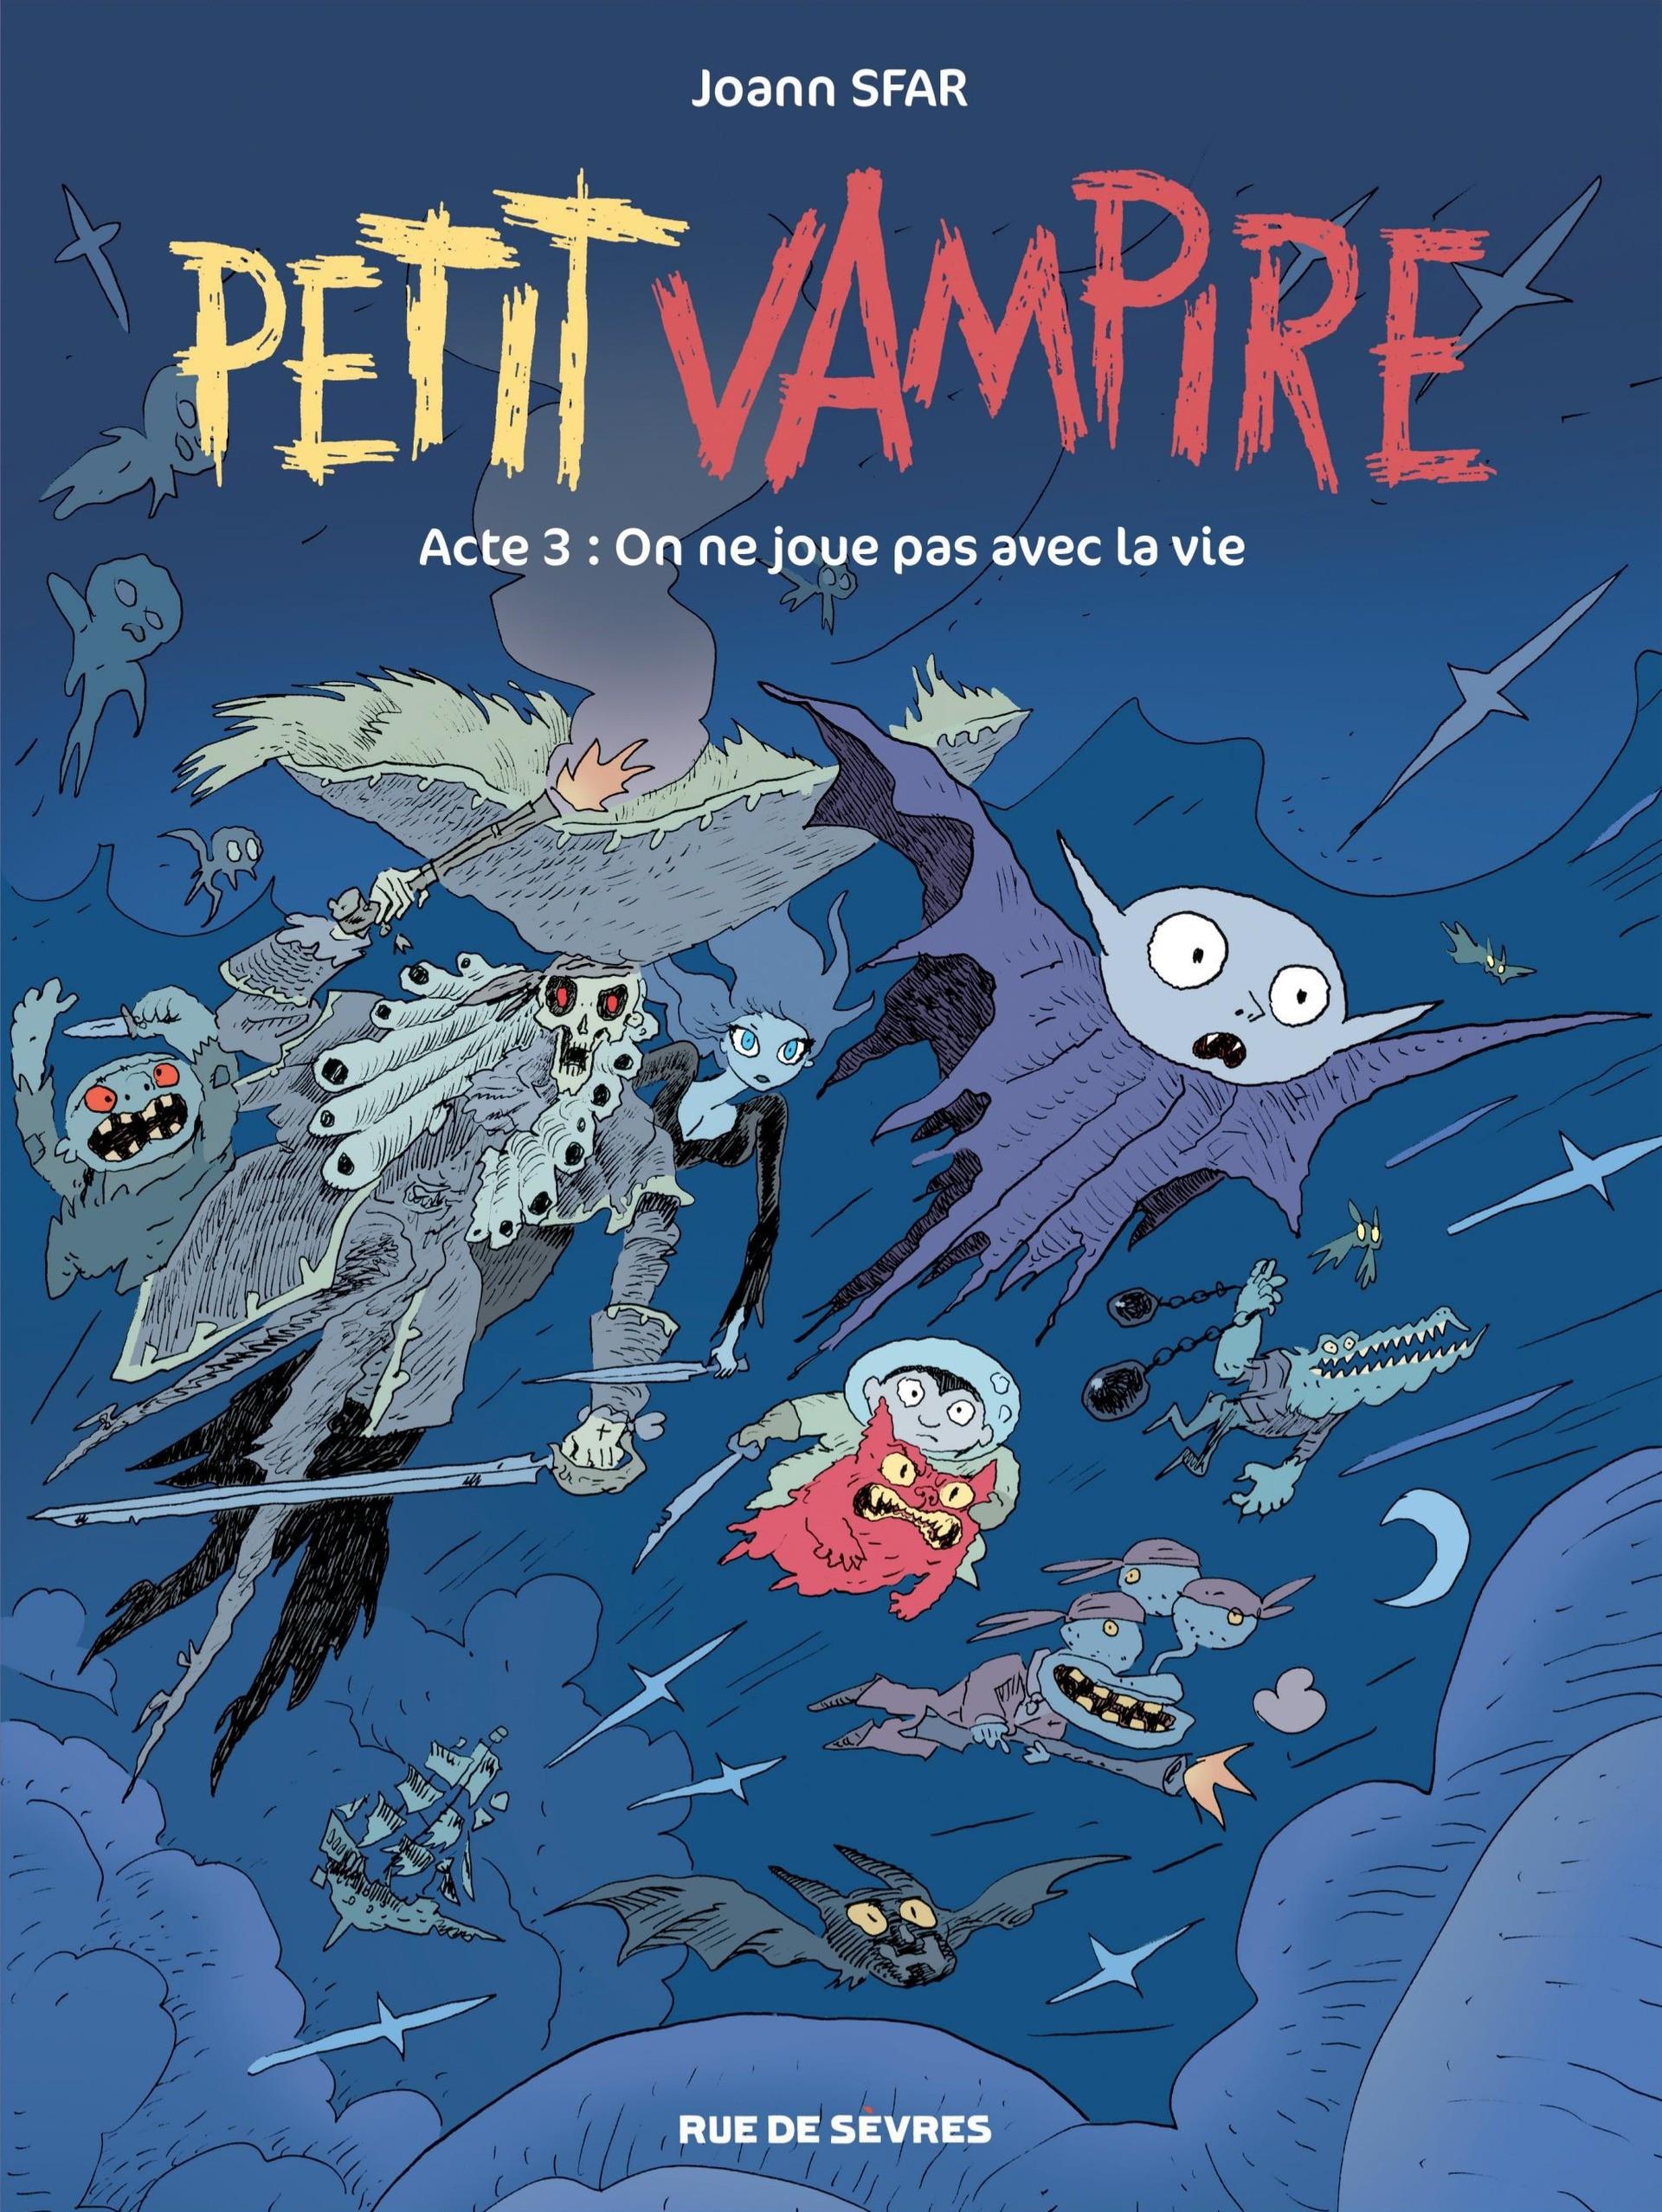 Petit vampire (2017) 3 - On ne joue pas avec la vie